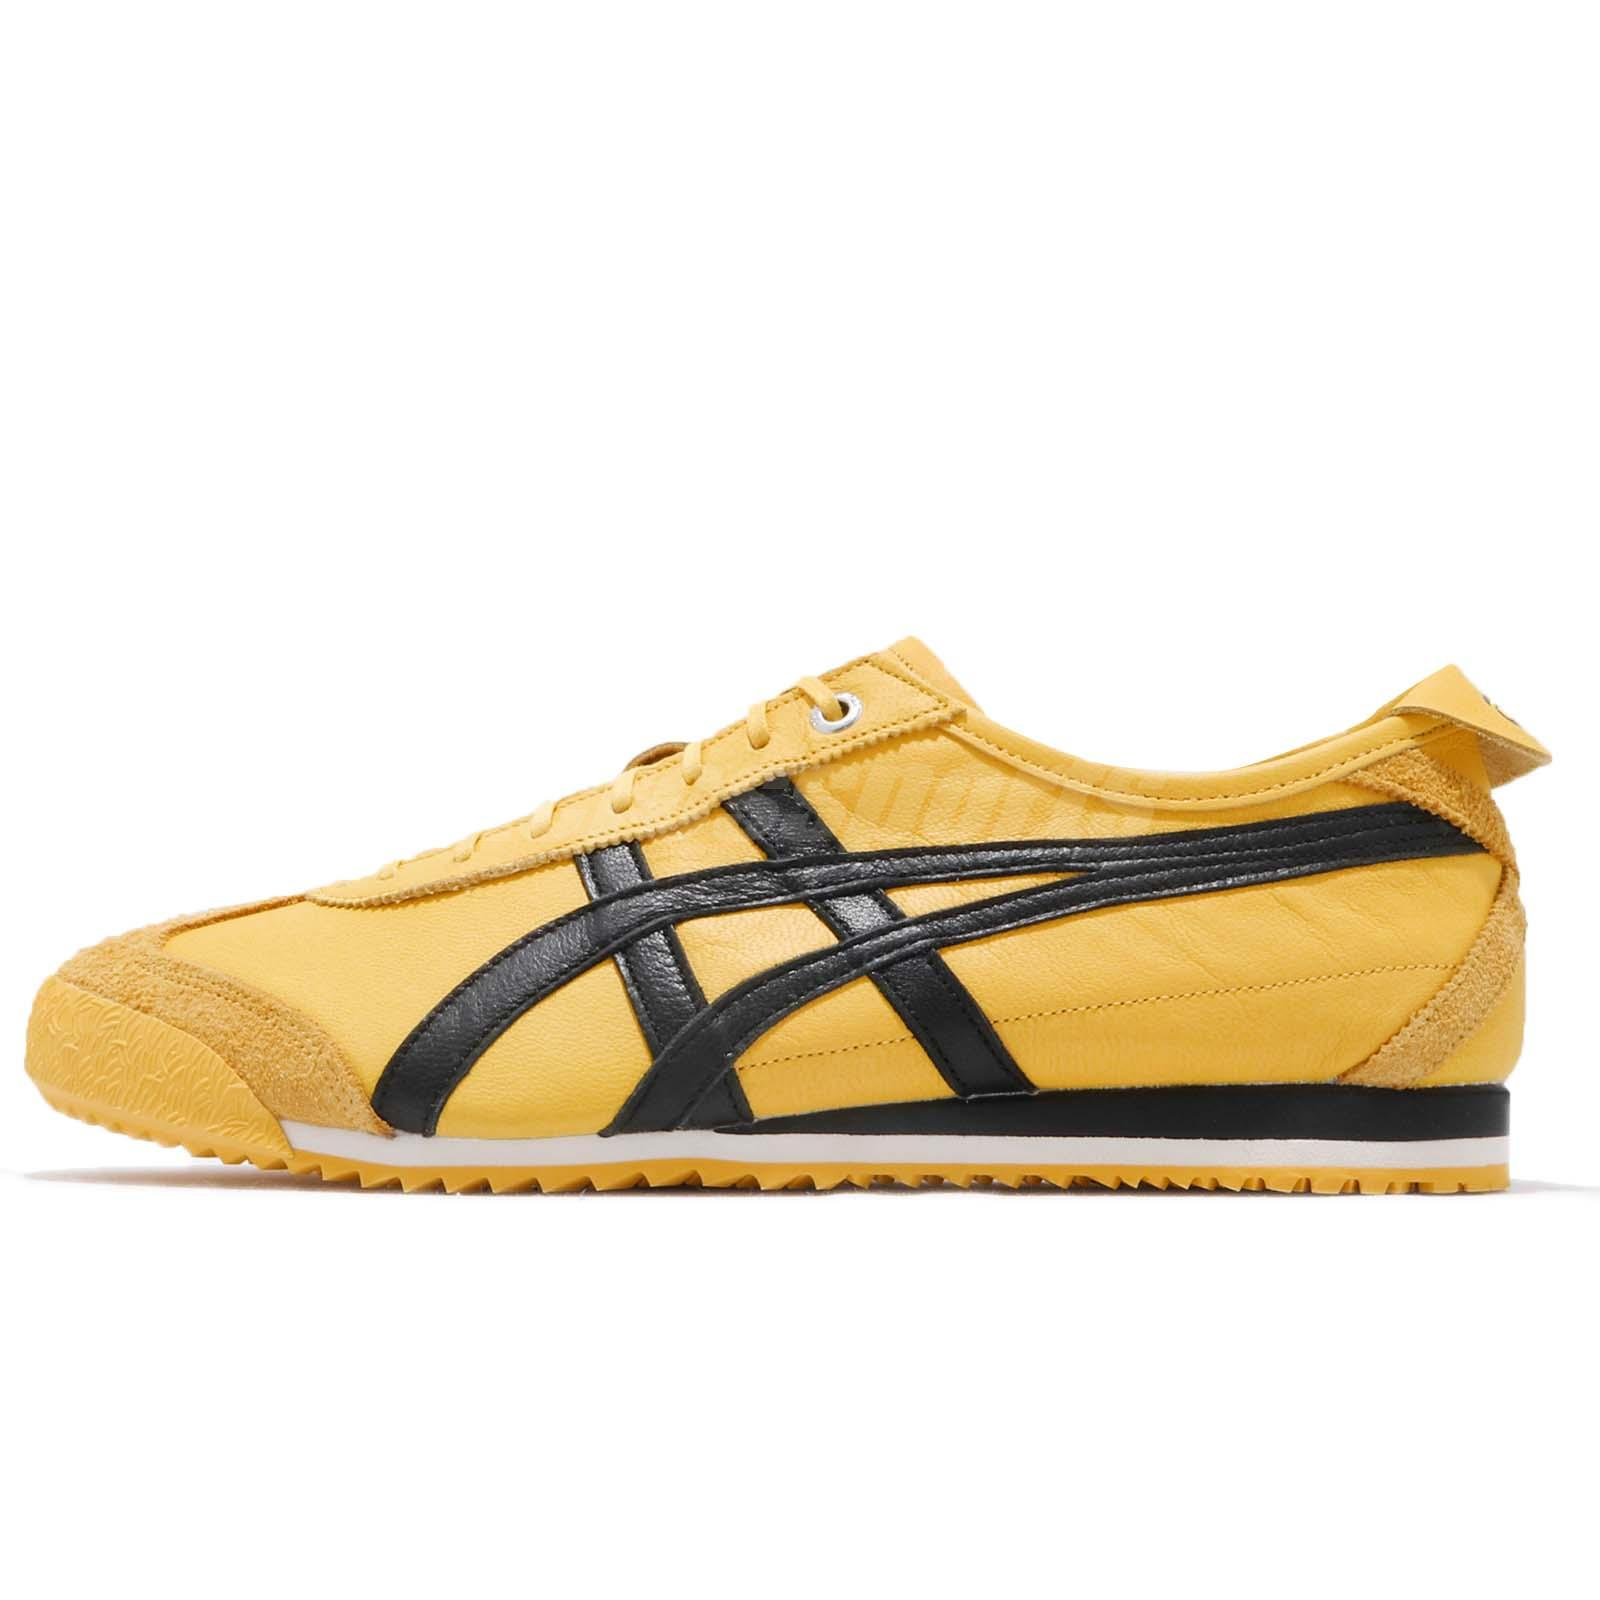 onitsuka tiger mexico 66 sd yellow black usa women's